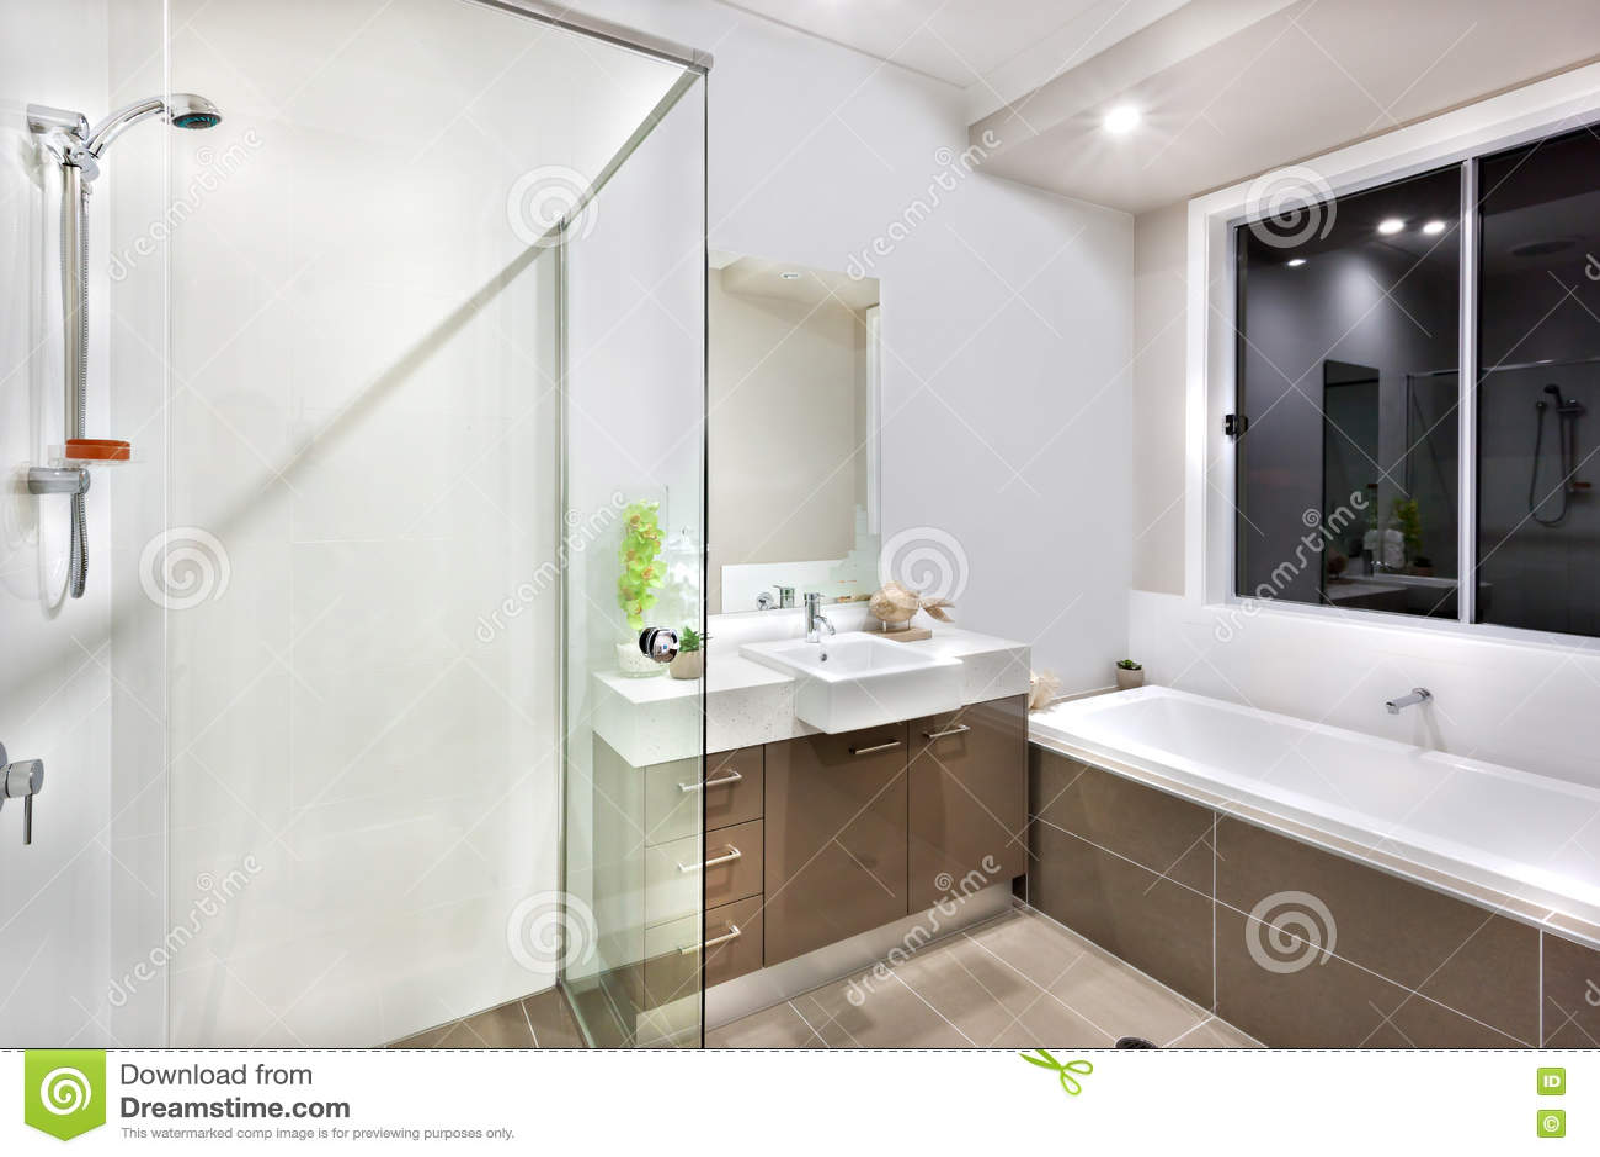 Det nya badrummet med tvättande område, inklusive bad badar